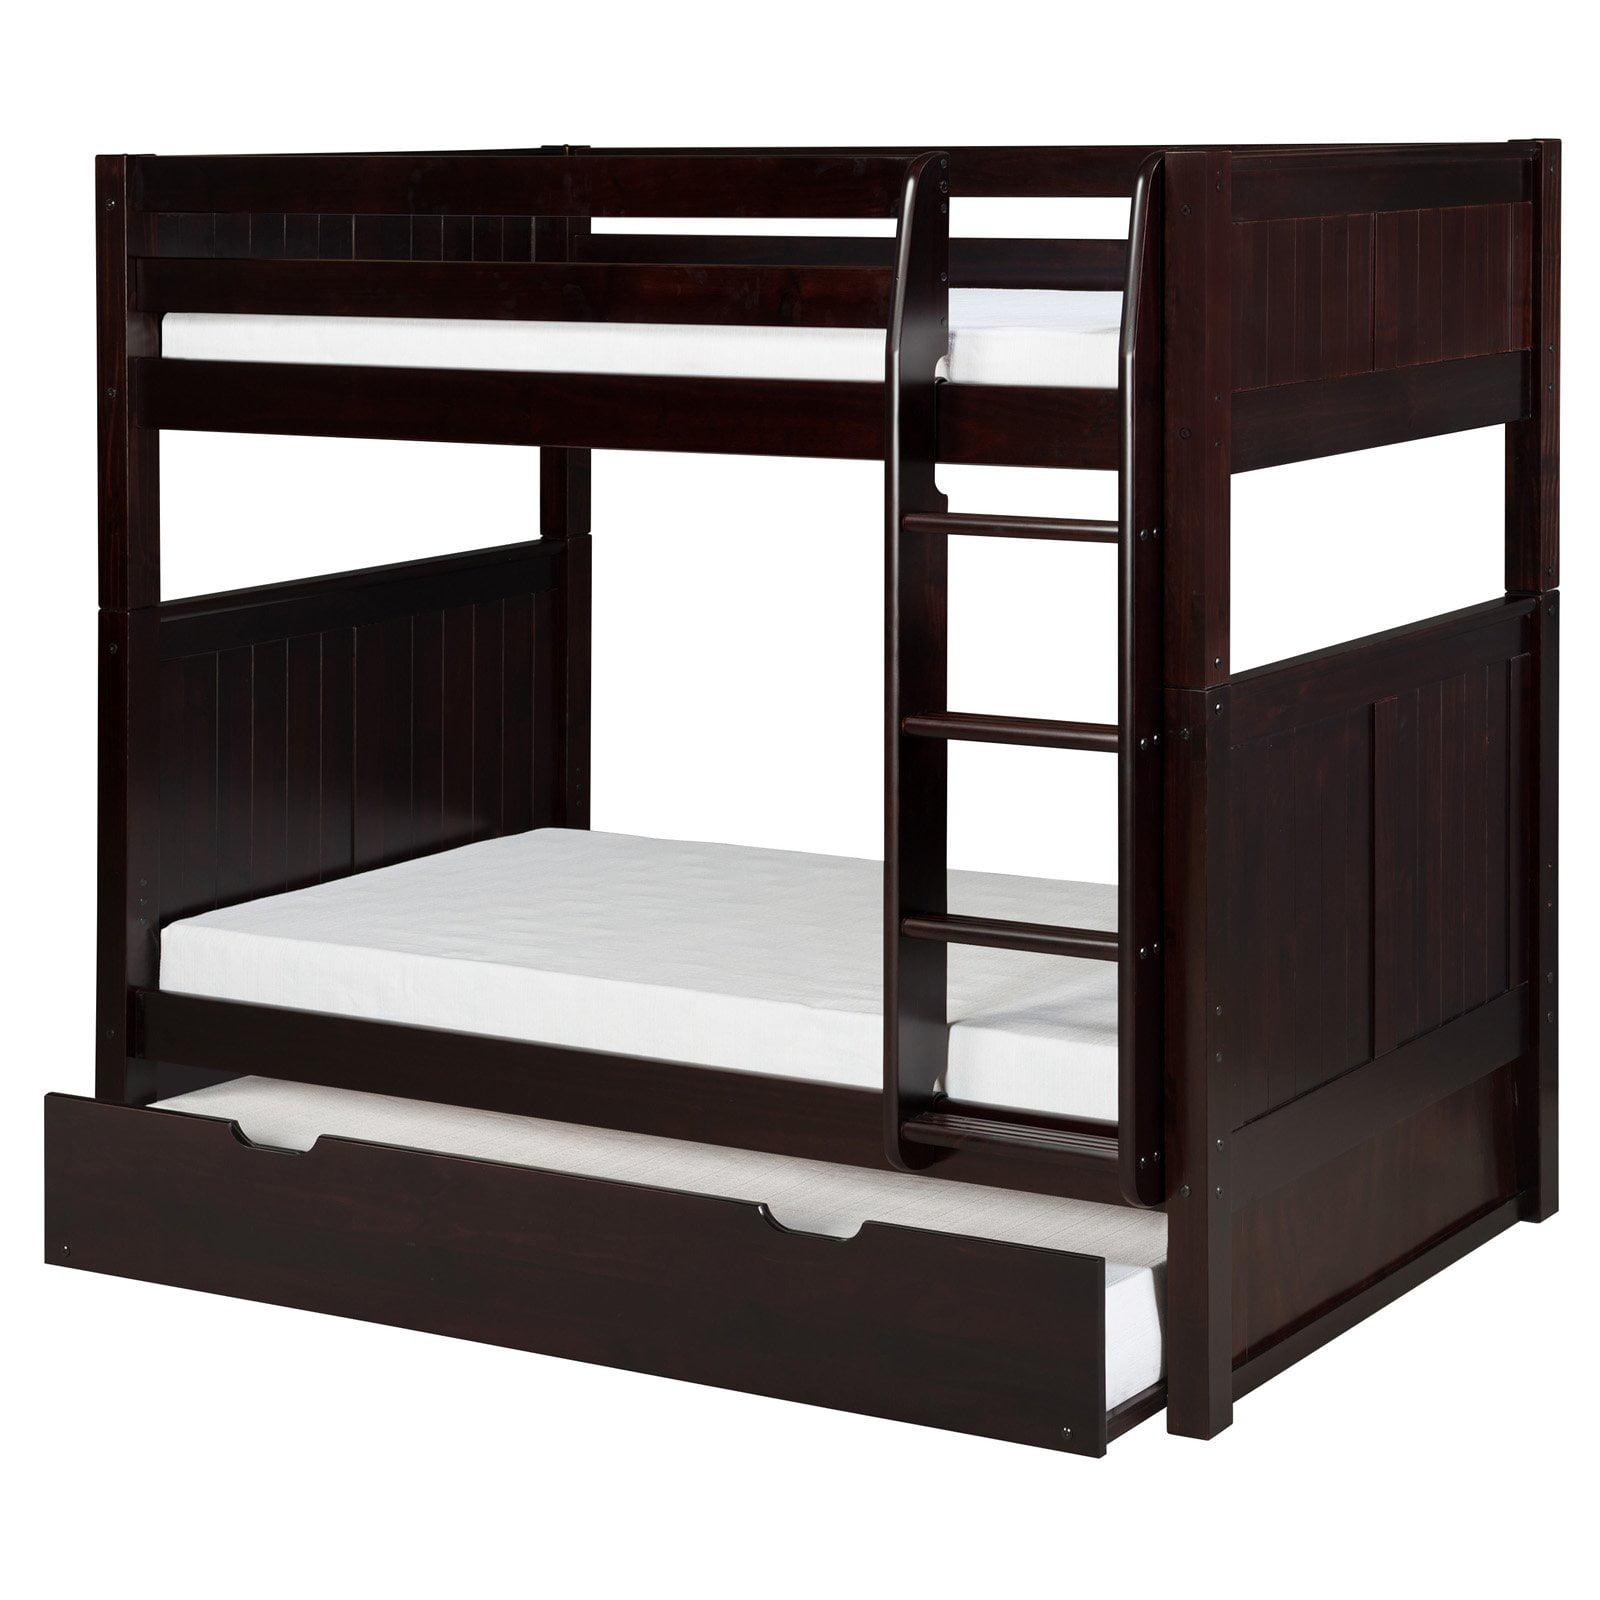 Camaflexi Panel Headboard Twin over Twin Bunk Bed by Eco-Flex